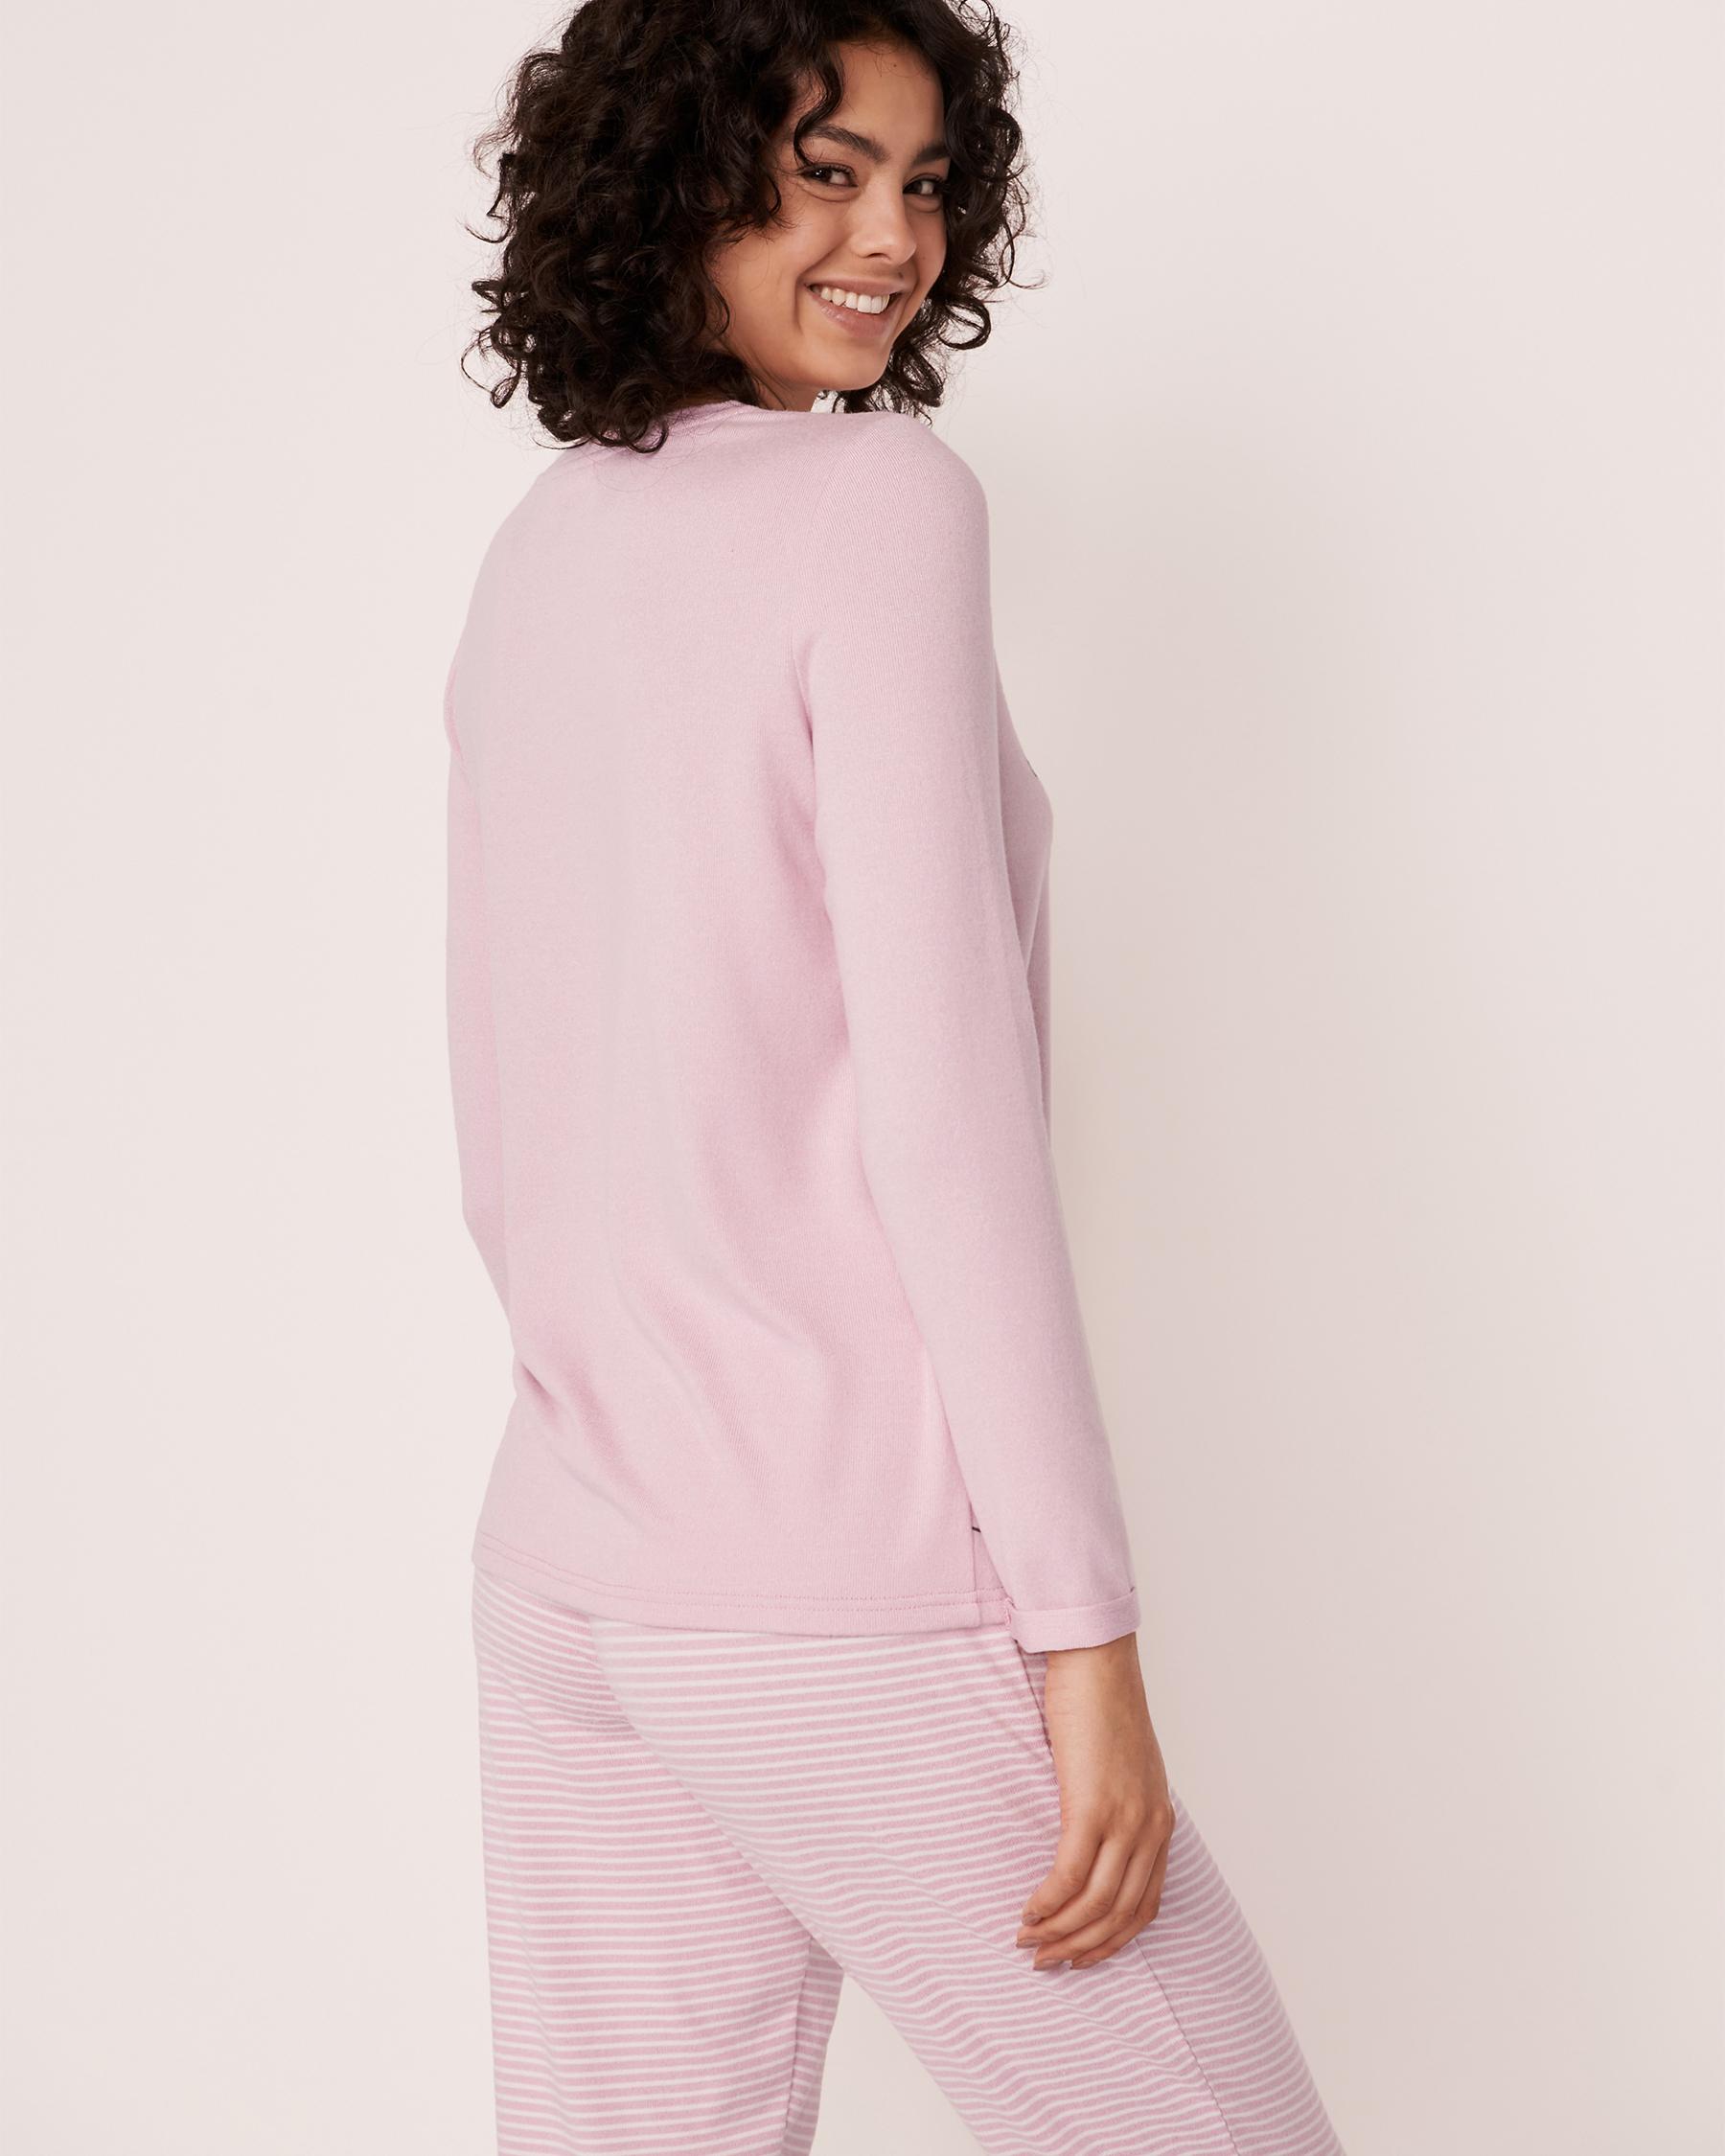 LA VIE EN ROSE Recycled Fibers Long Sleeve Shirt Light pink mix 40100142 - View4